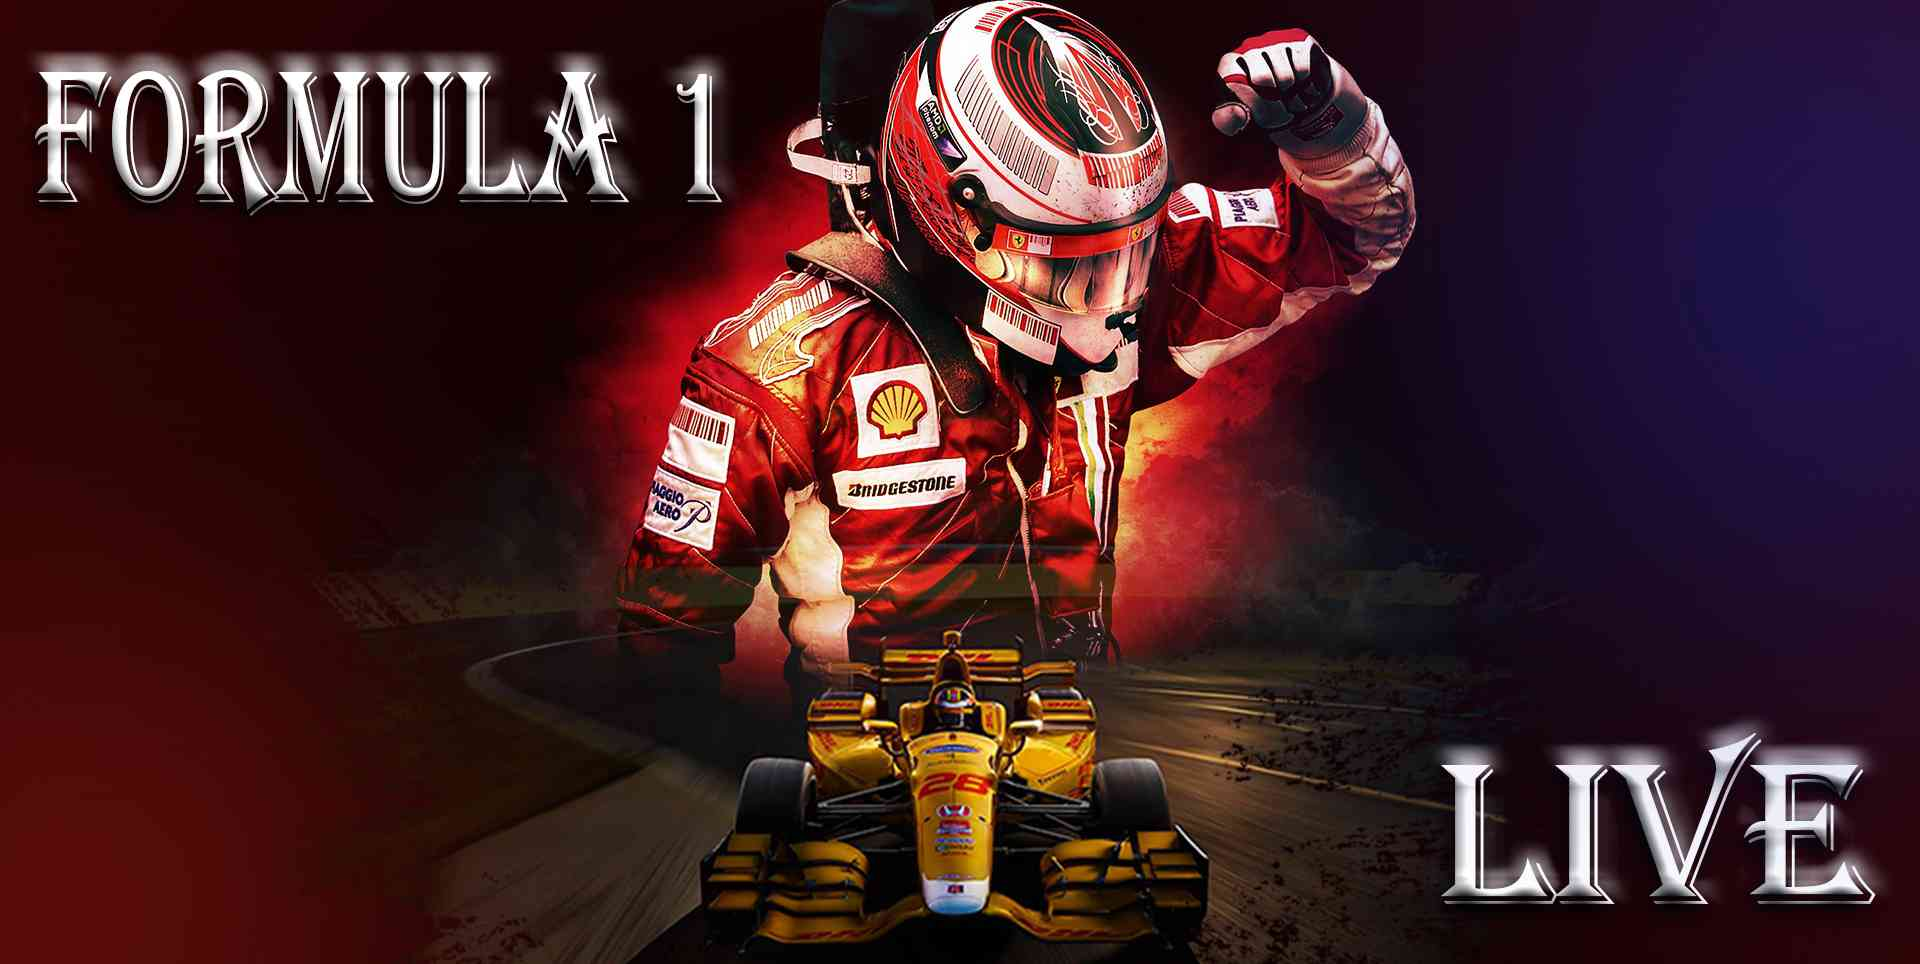 live-ferrari-challenge-monza-car-race-online-stream